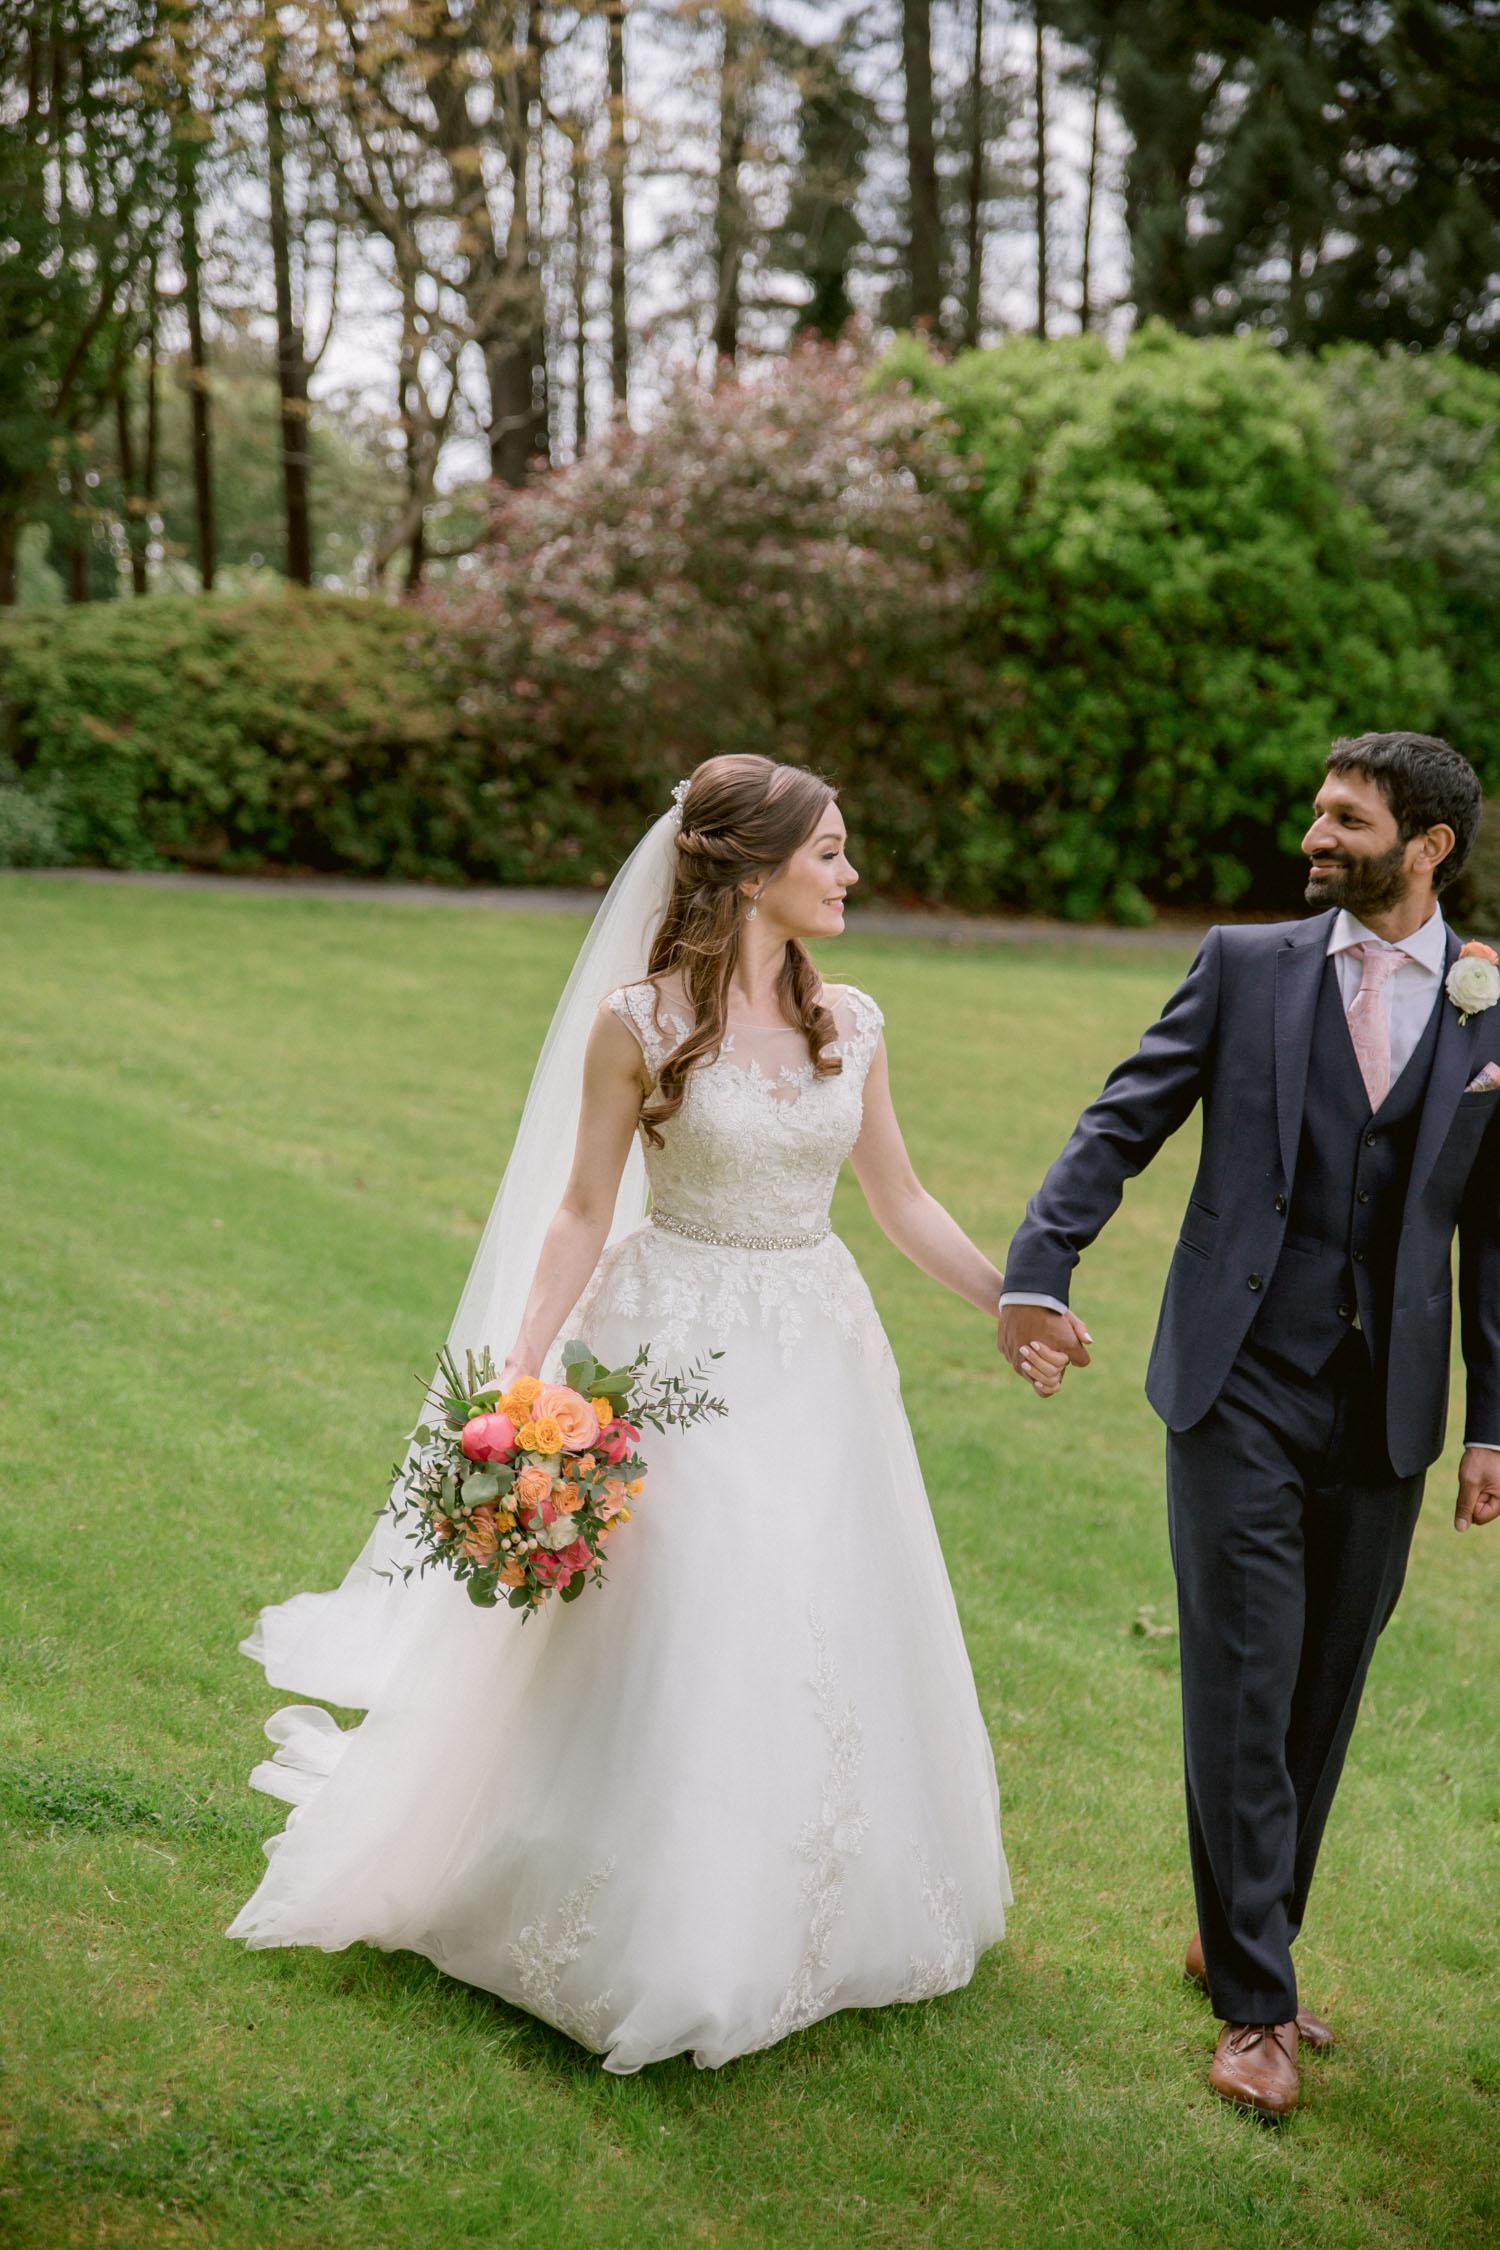 Ayrshire bright wedding photography by Ceranna